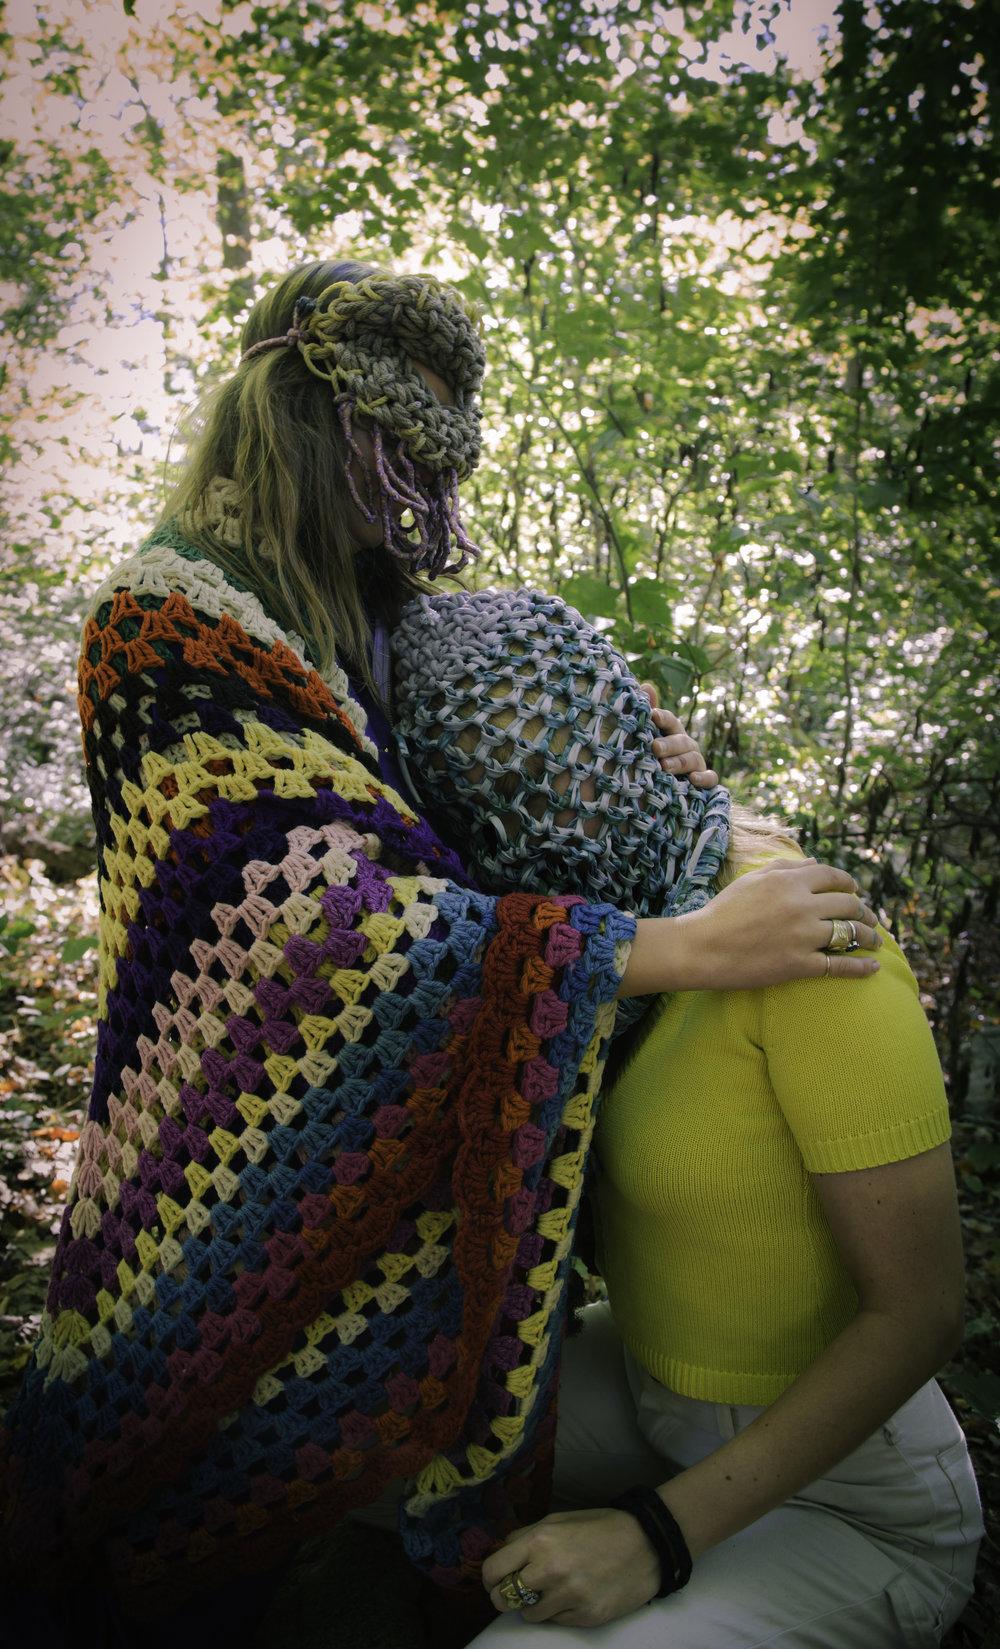 Faðma (Embrace) I, 2017